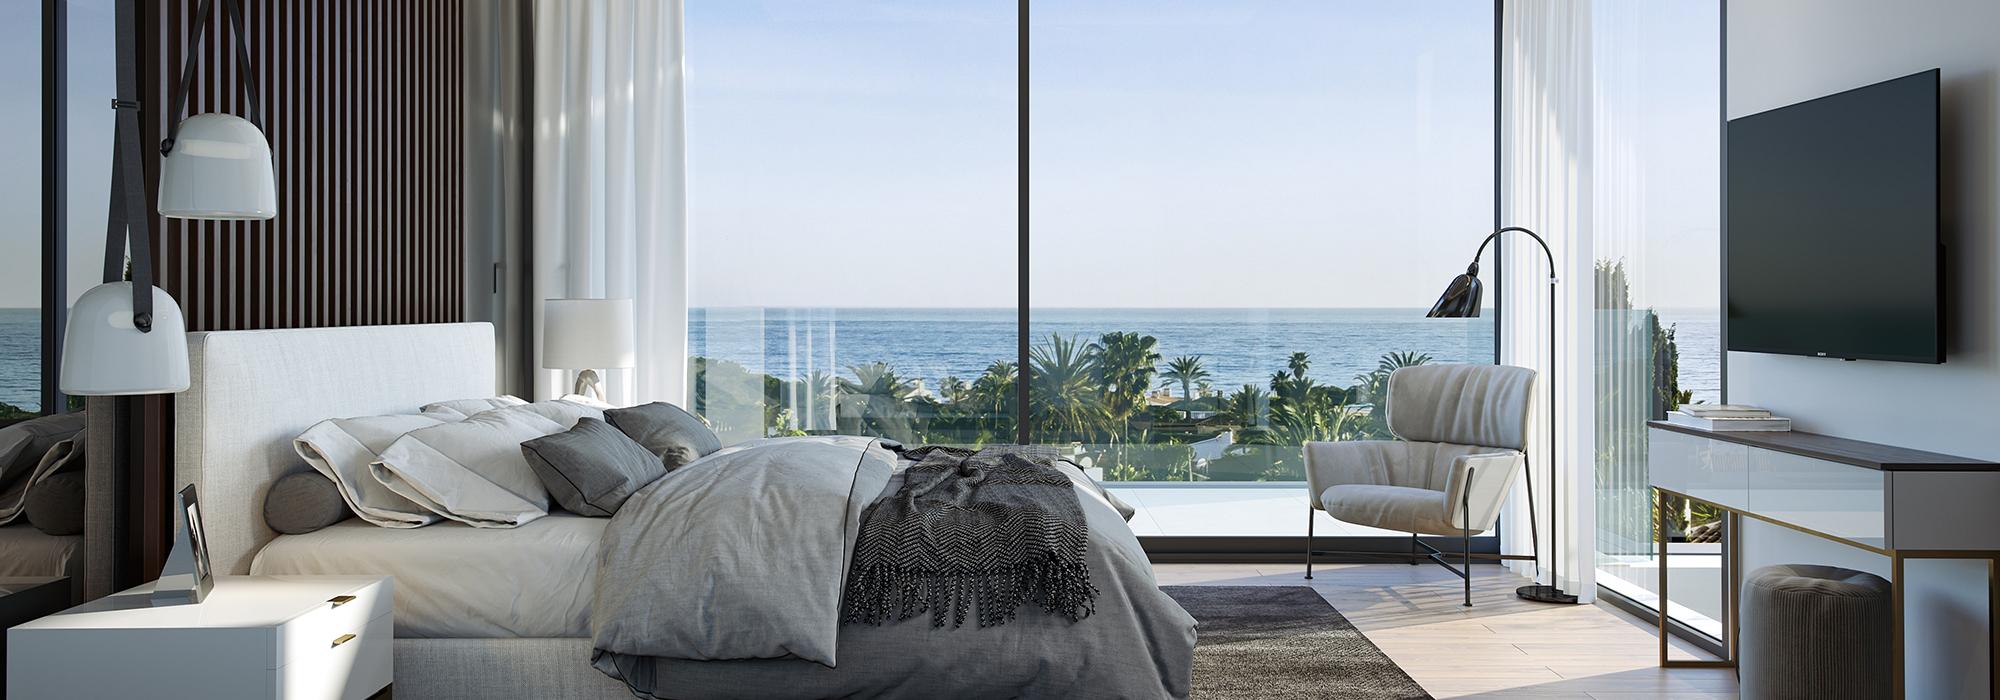 Fabulous Modern New Villa in Marbesa Beach